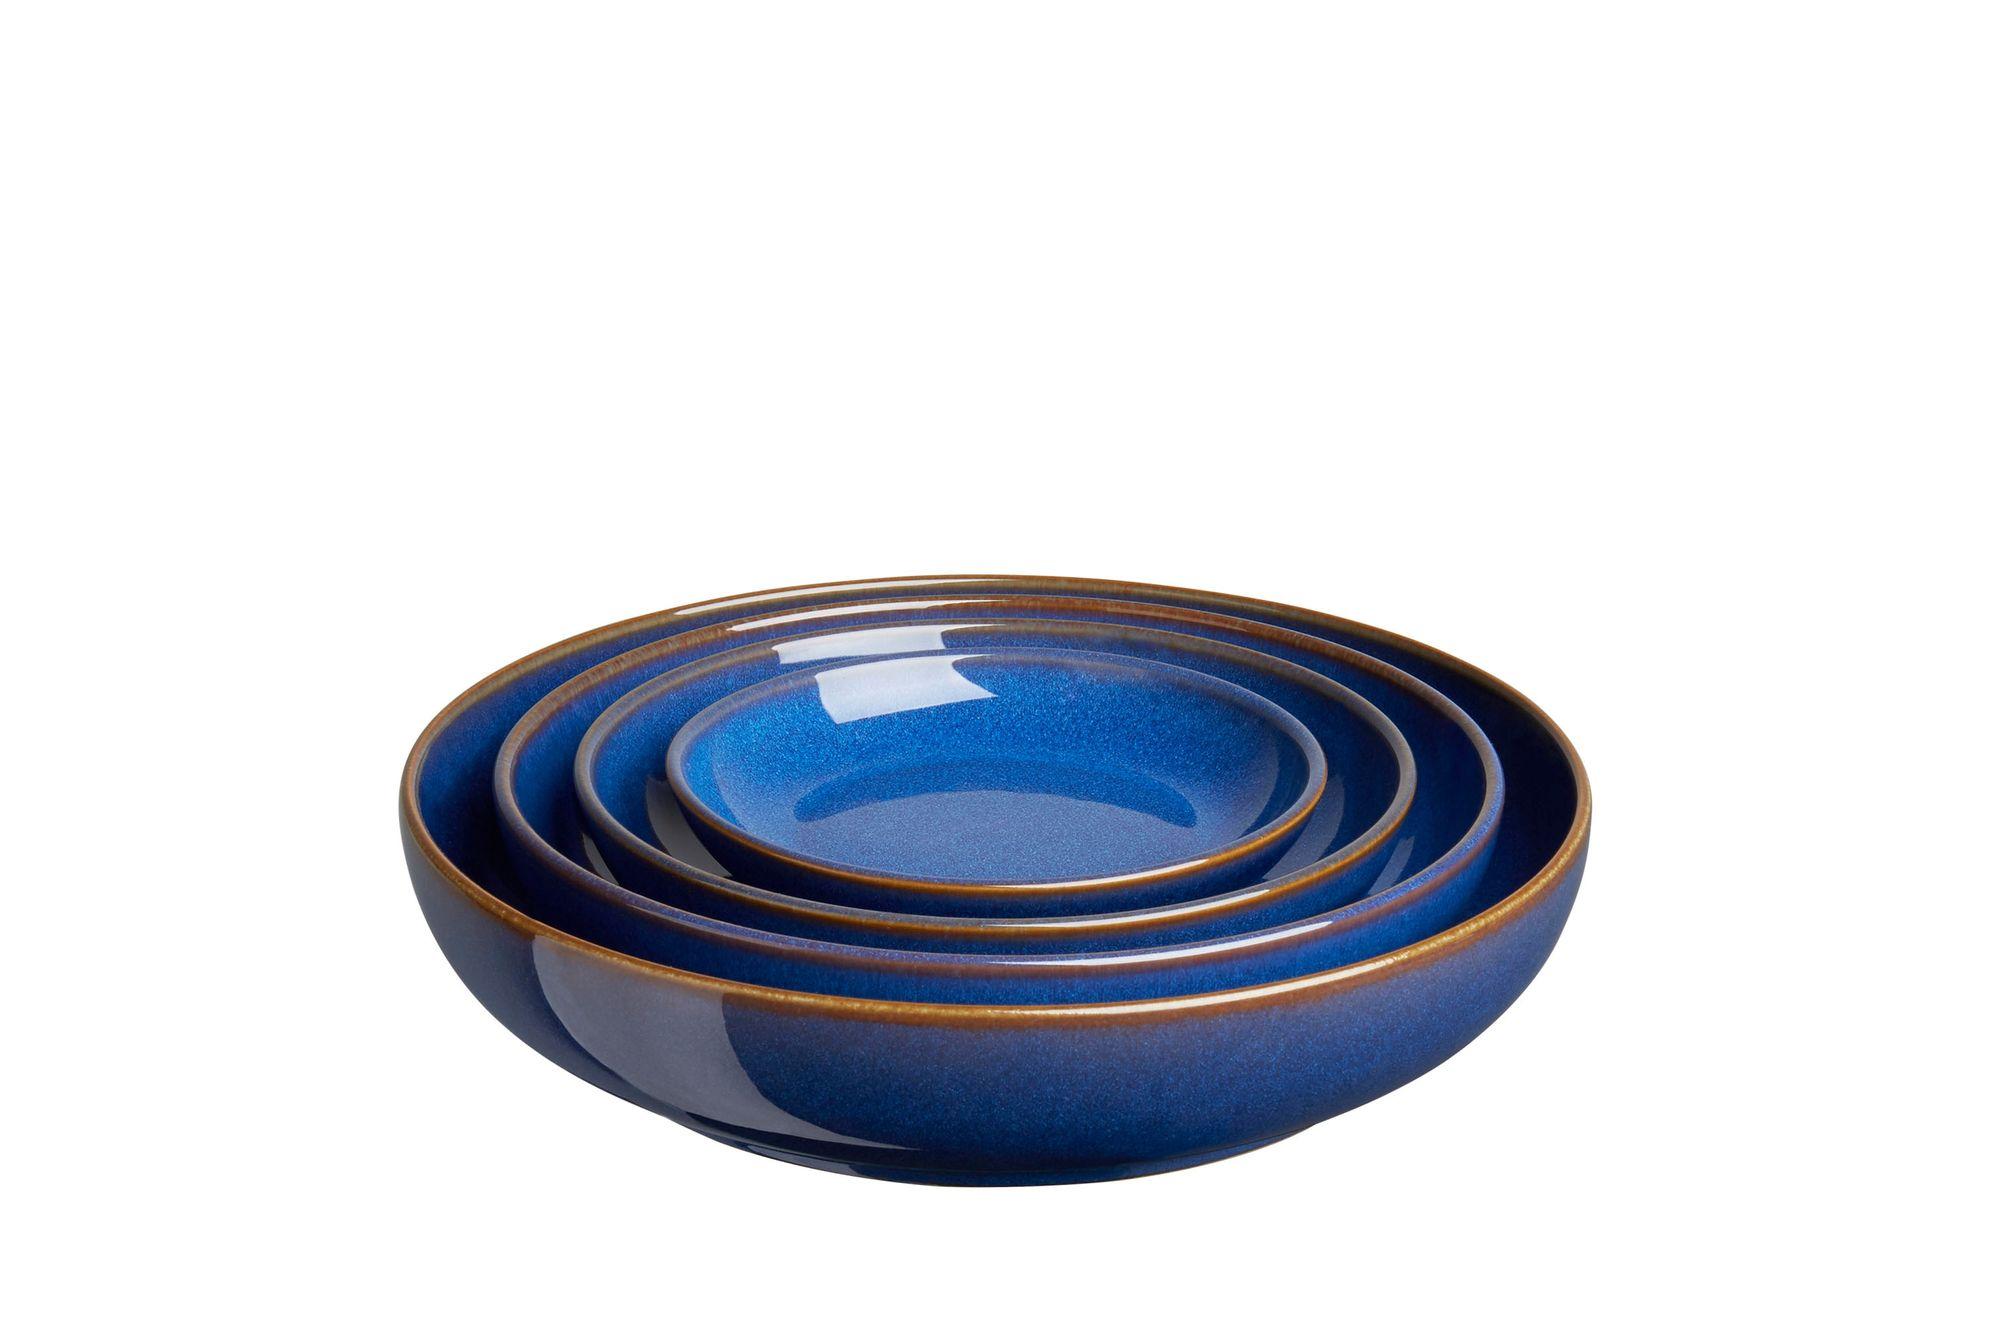 Denby Imperial Blue 4 Piece Nesting Bowl Set thumb 1